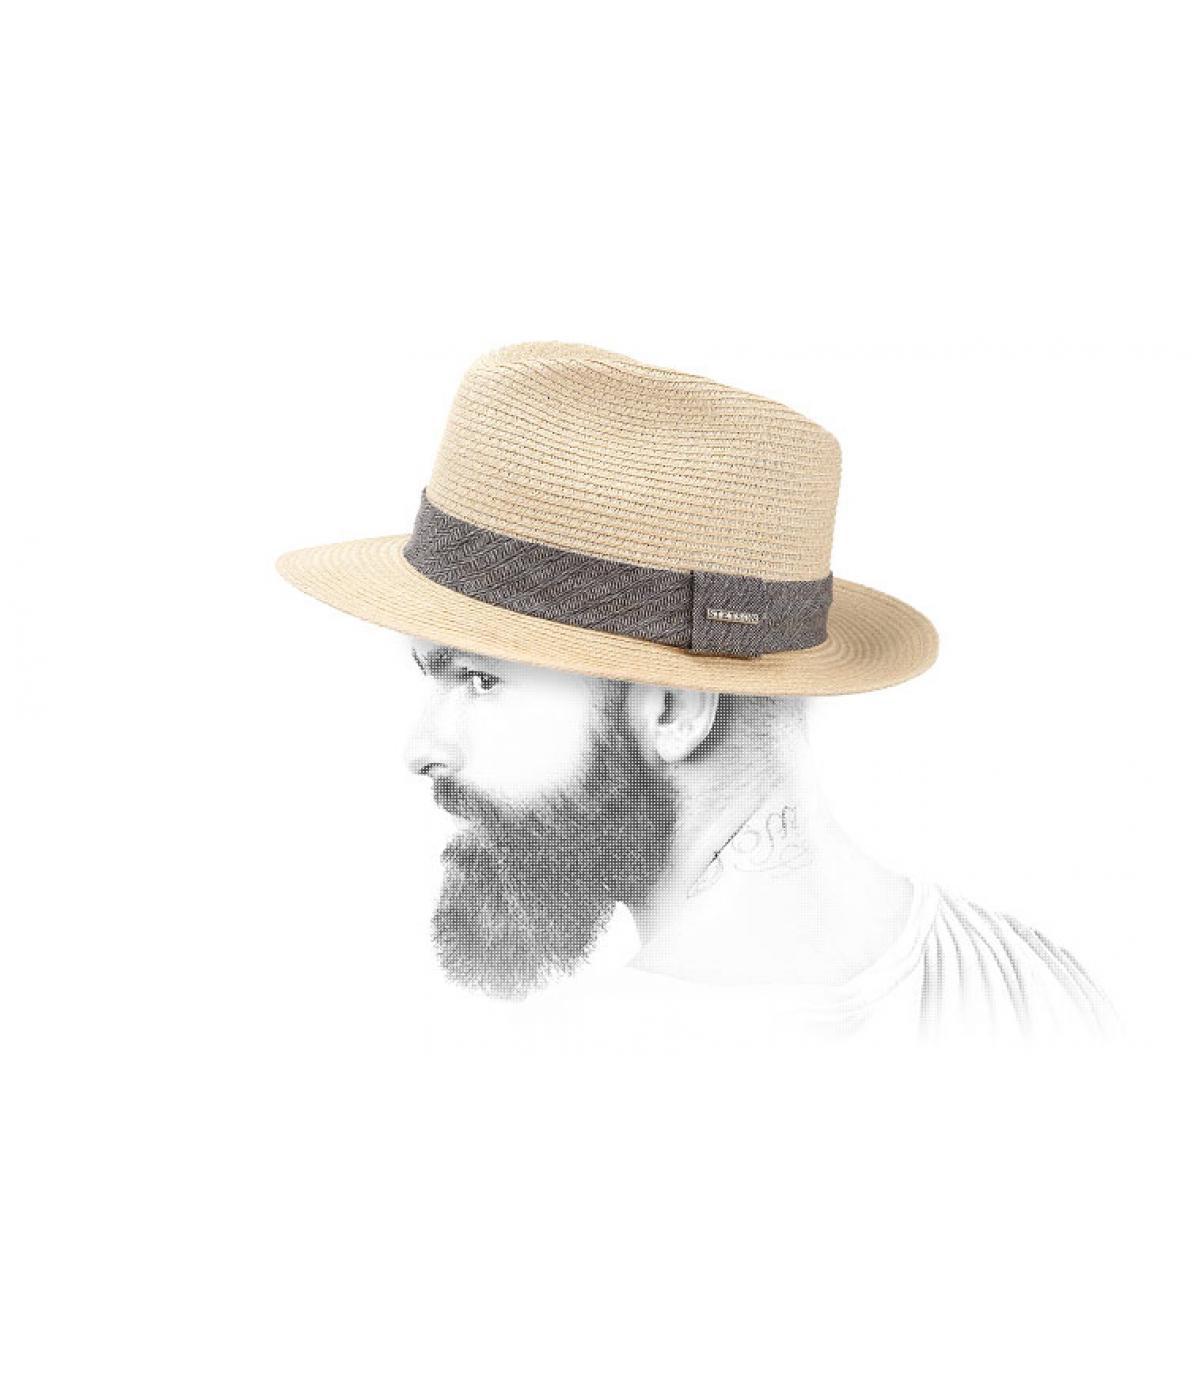 Sombrero paja hombre Stetson